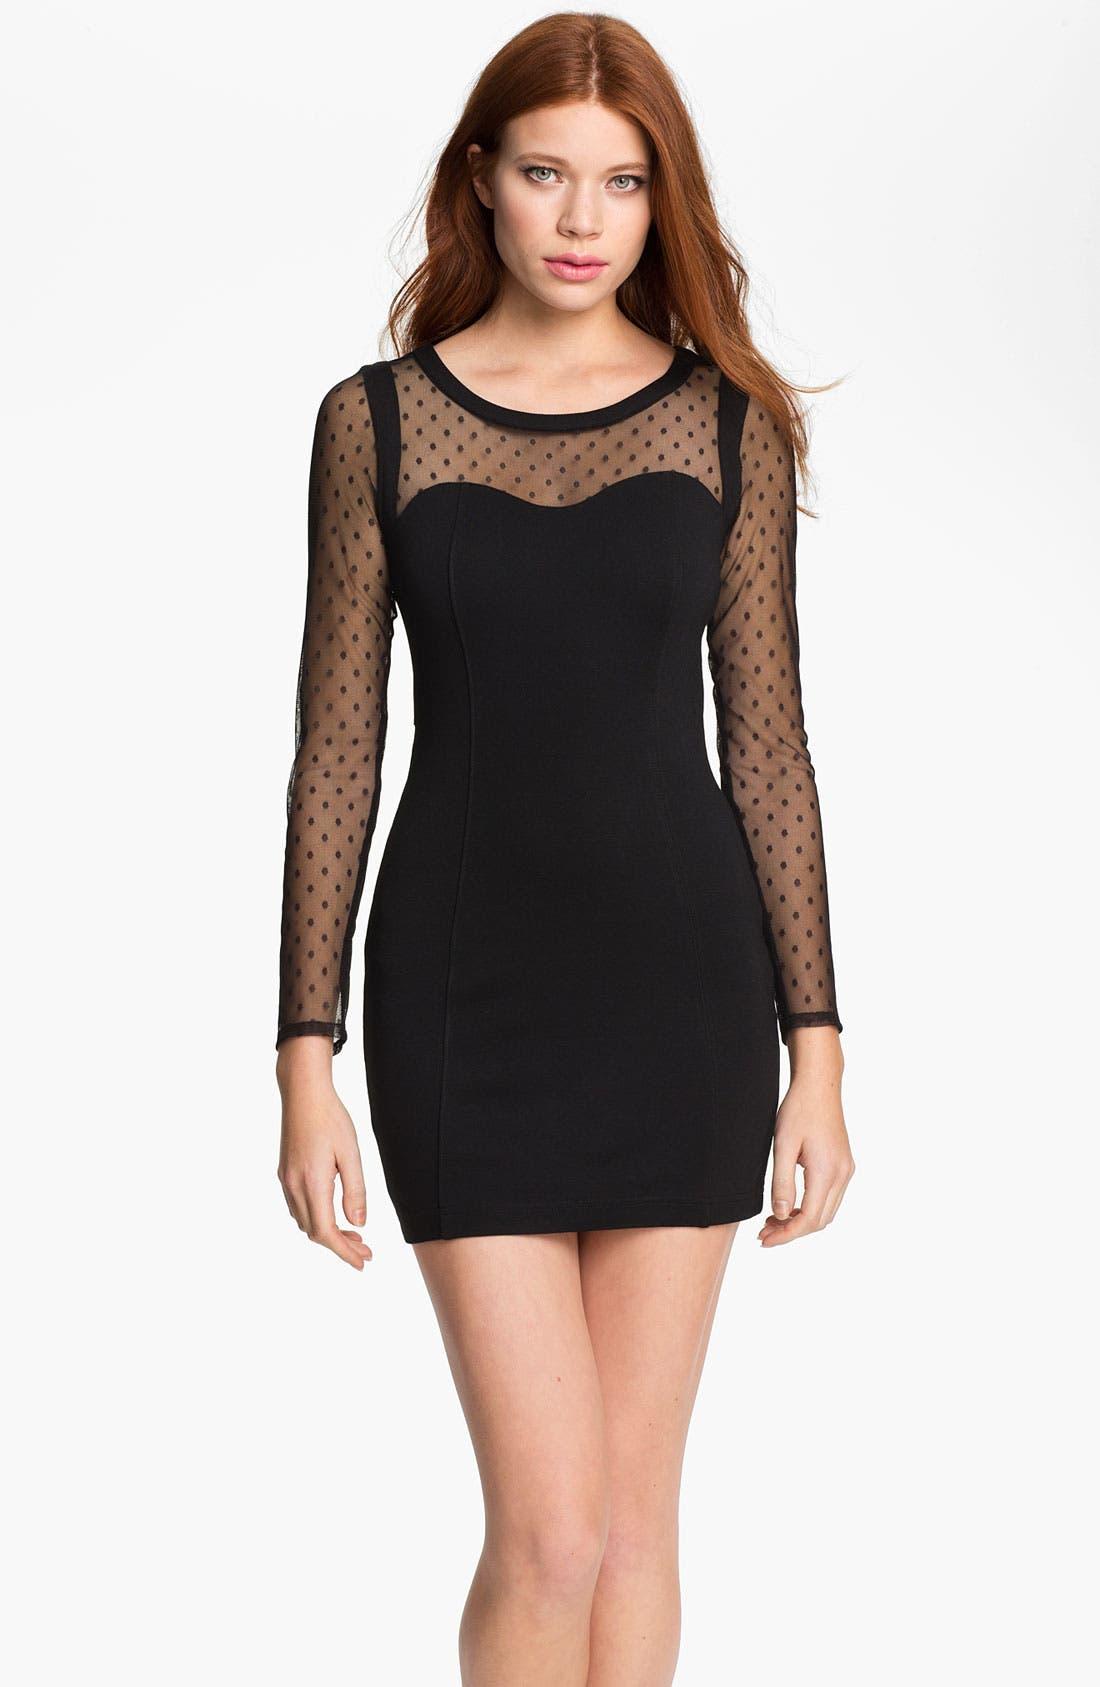 Alternate Image 1 Selected - Keepsake the Label 'Devotion' Contoured Mini Dress